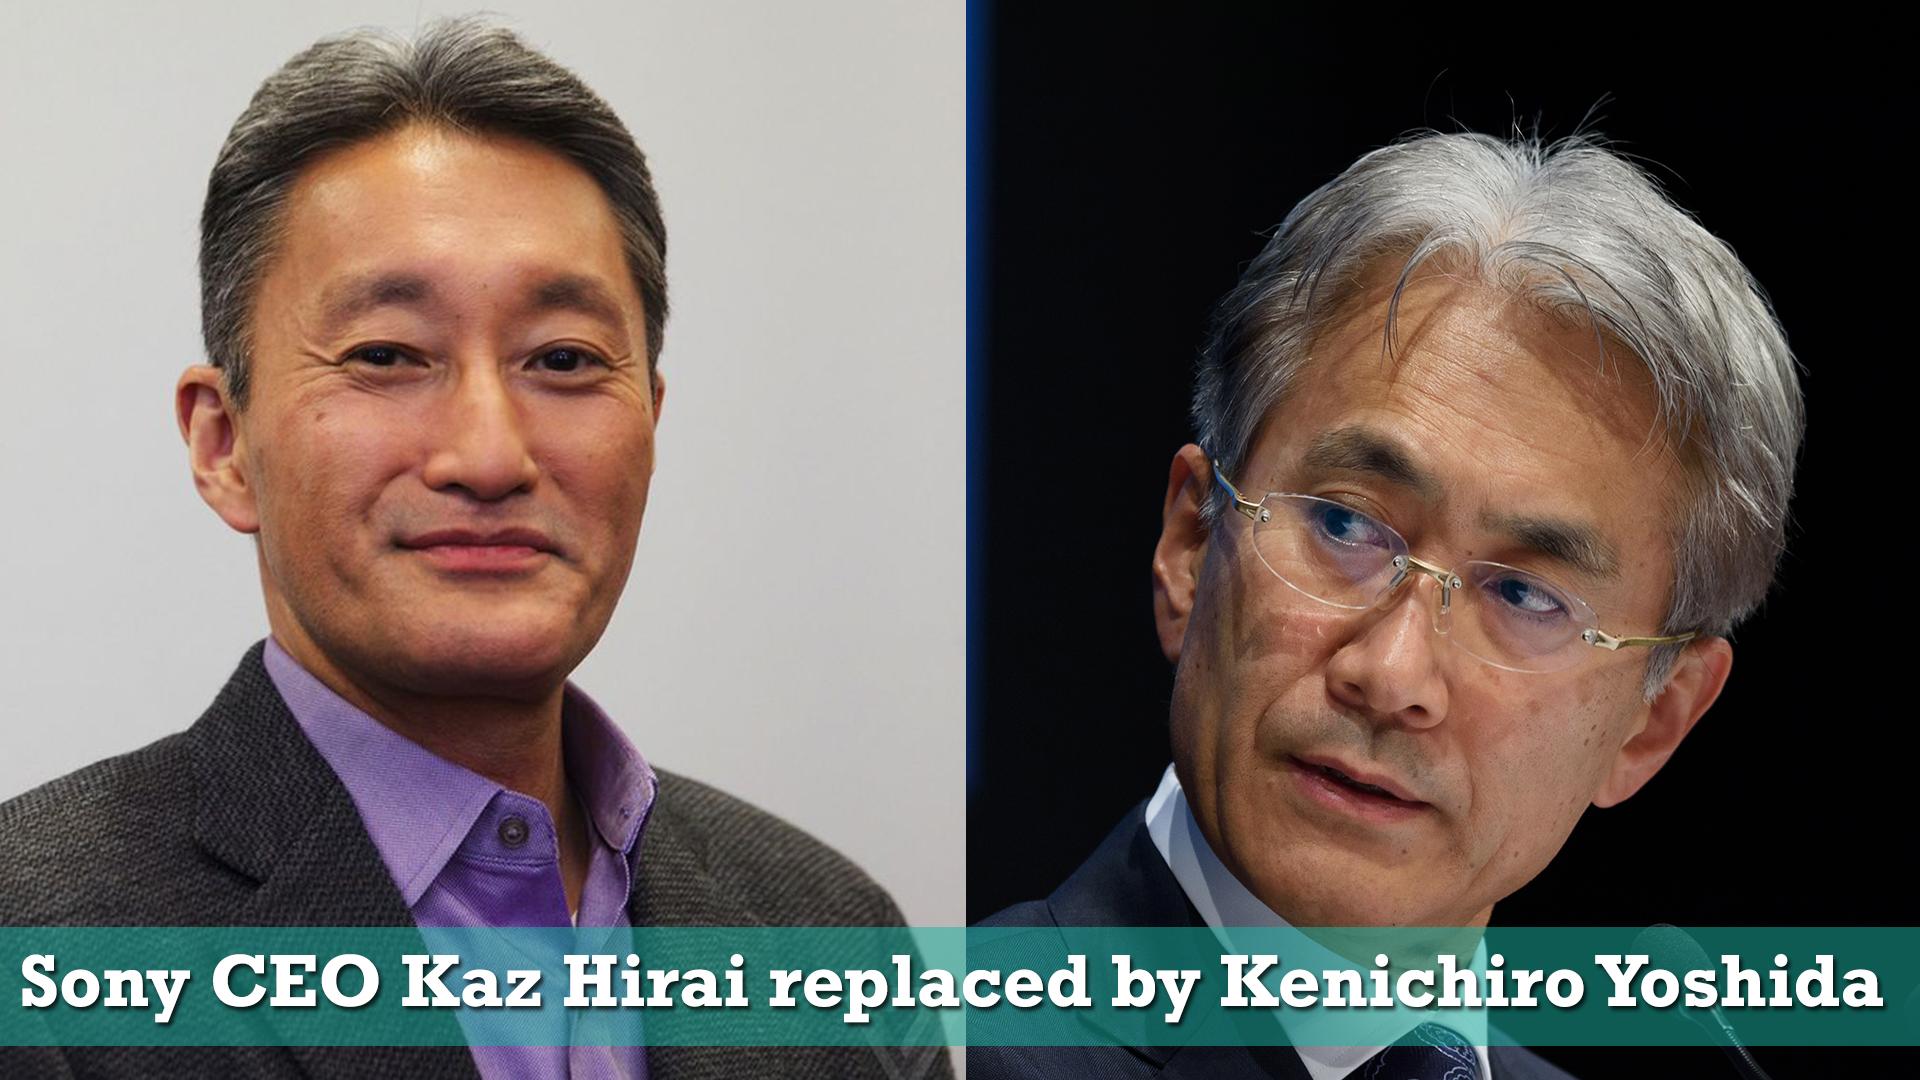 Sony CEO Kaz Hirai will step down on 1st April 2018